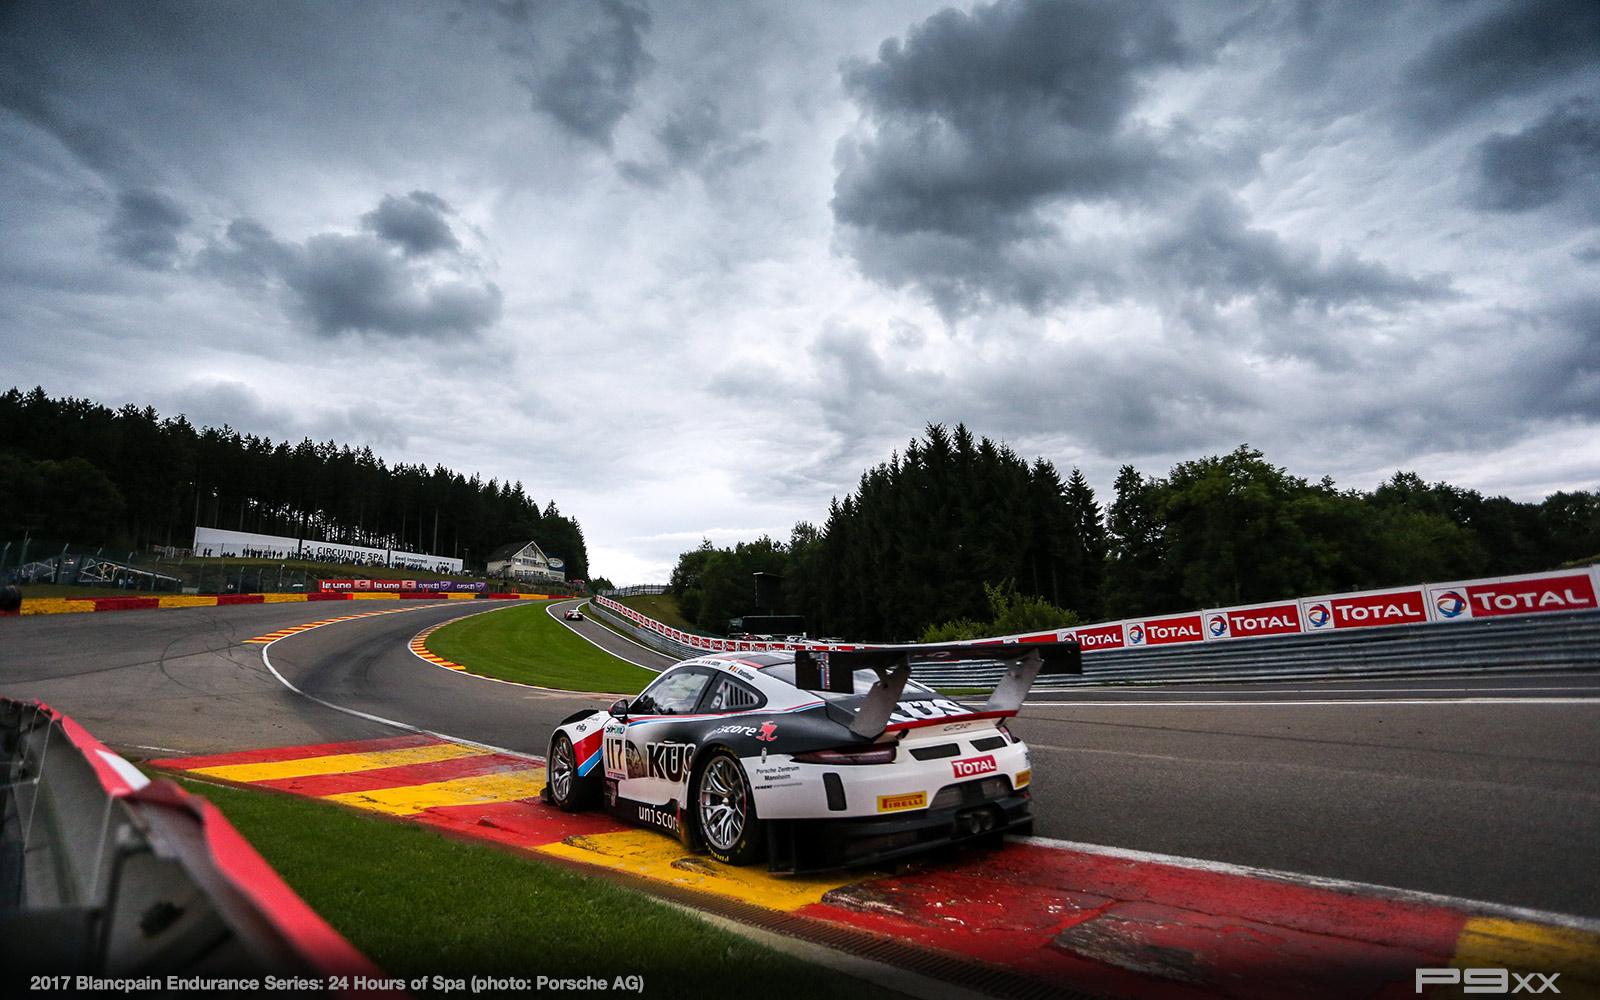 2017-24-Hours-of-Spa-Porsche-339